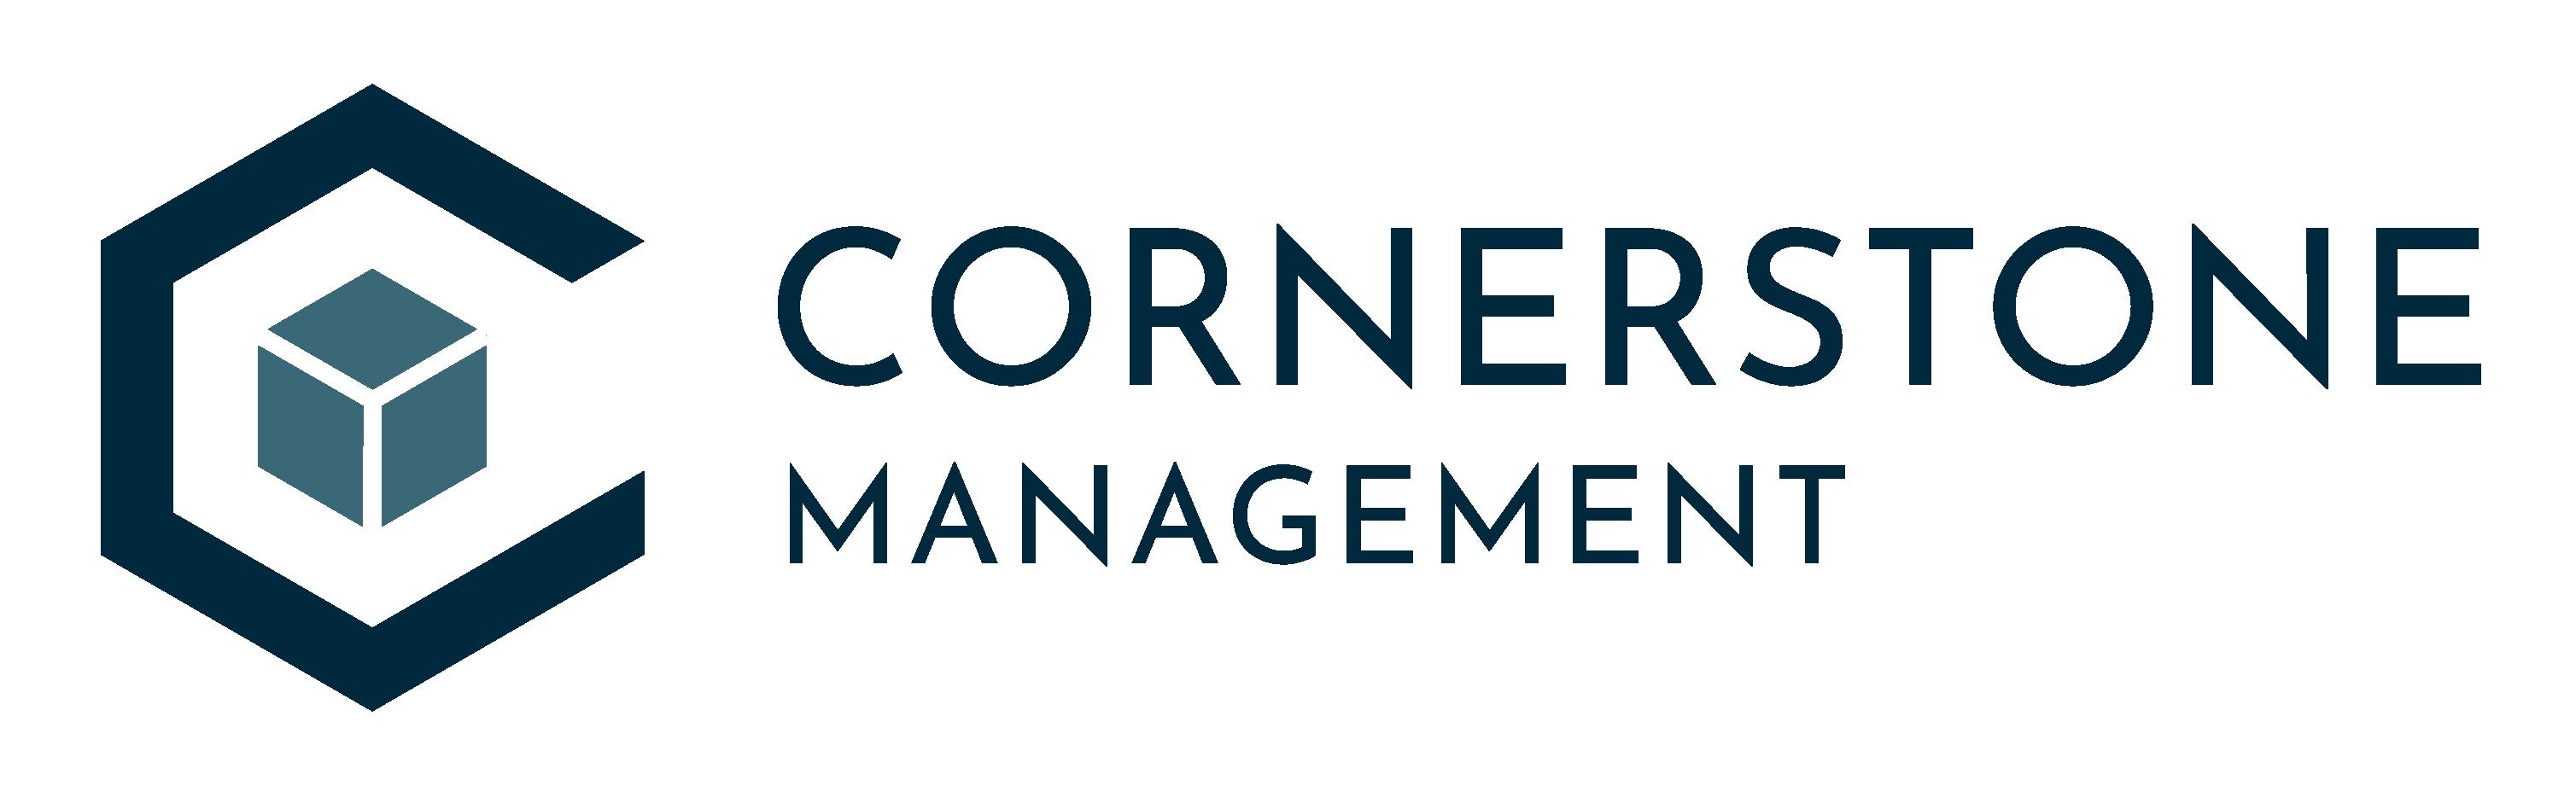 cornerstone-management-logo